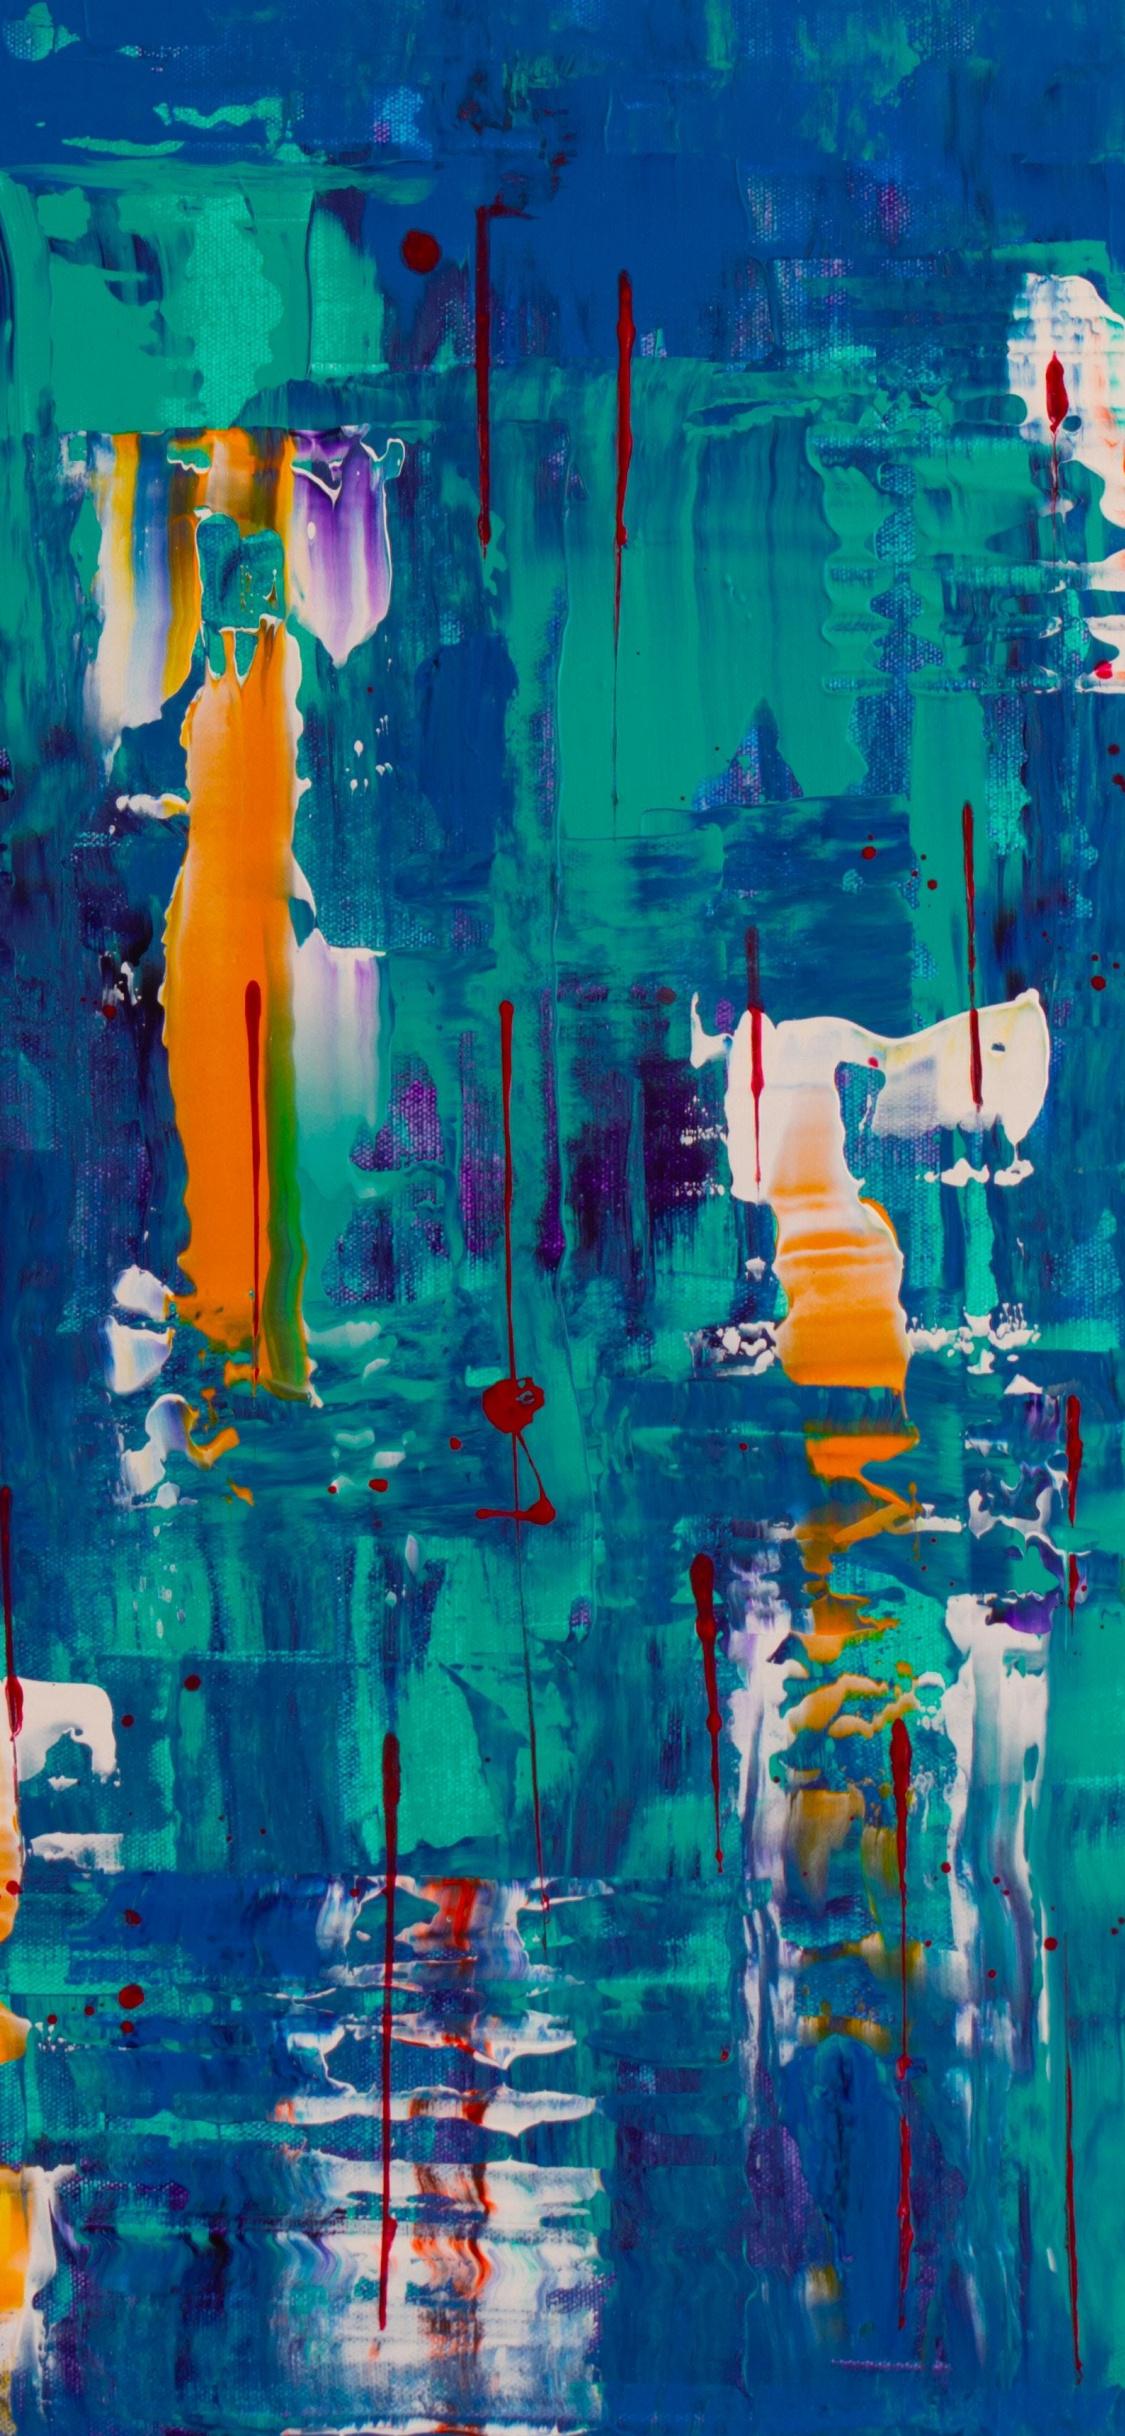 Abstract Painting, Colorful, Modern Art, Wallpaper - Abstract Art - HD Wallpaper